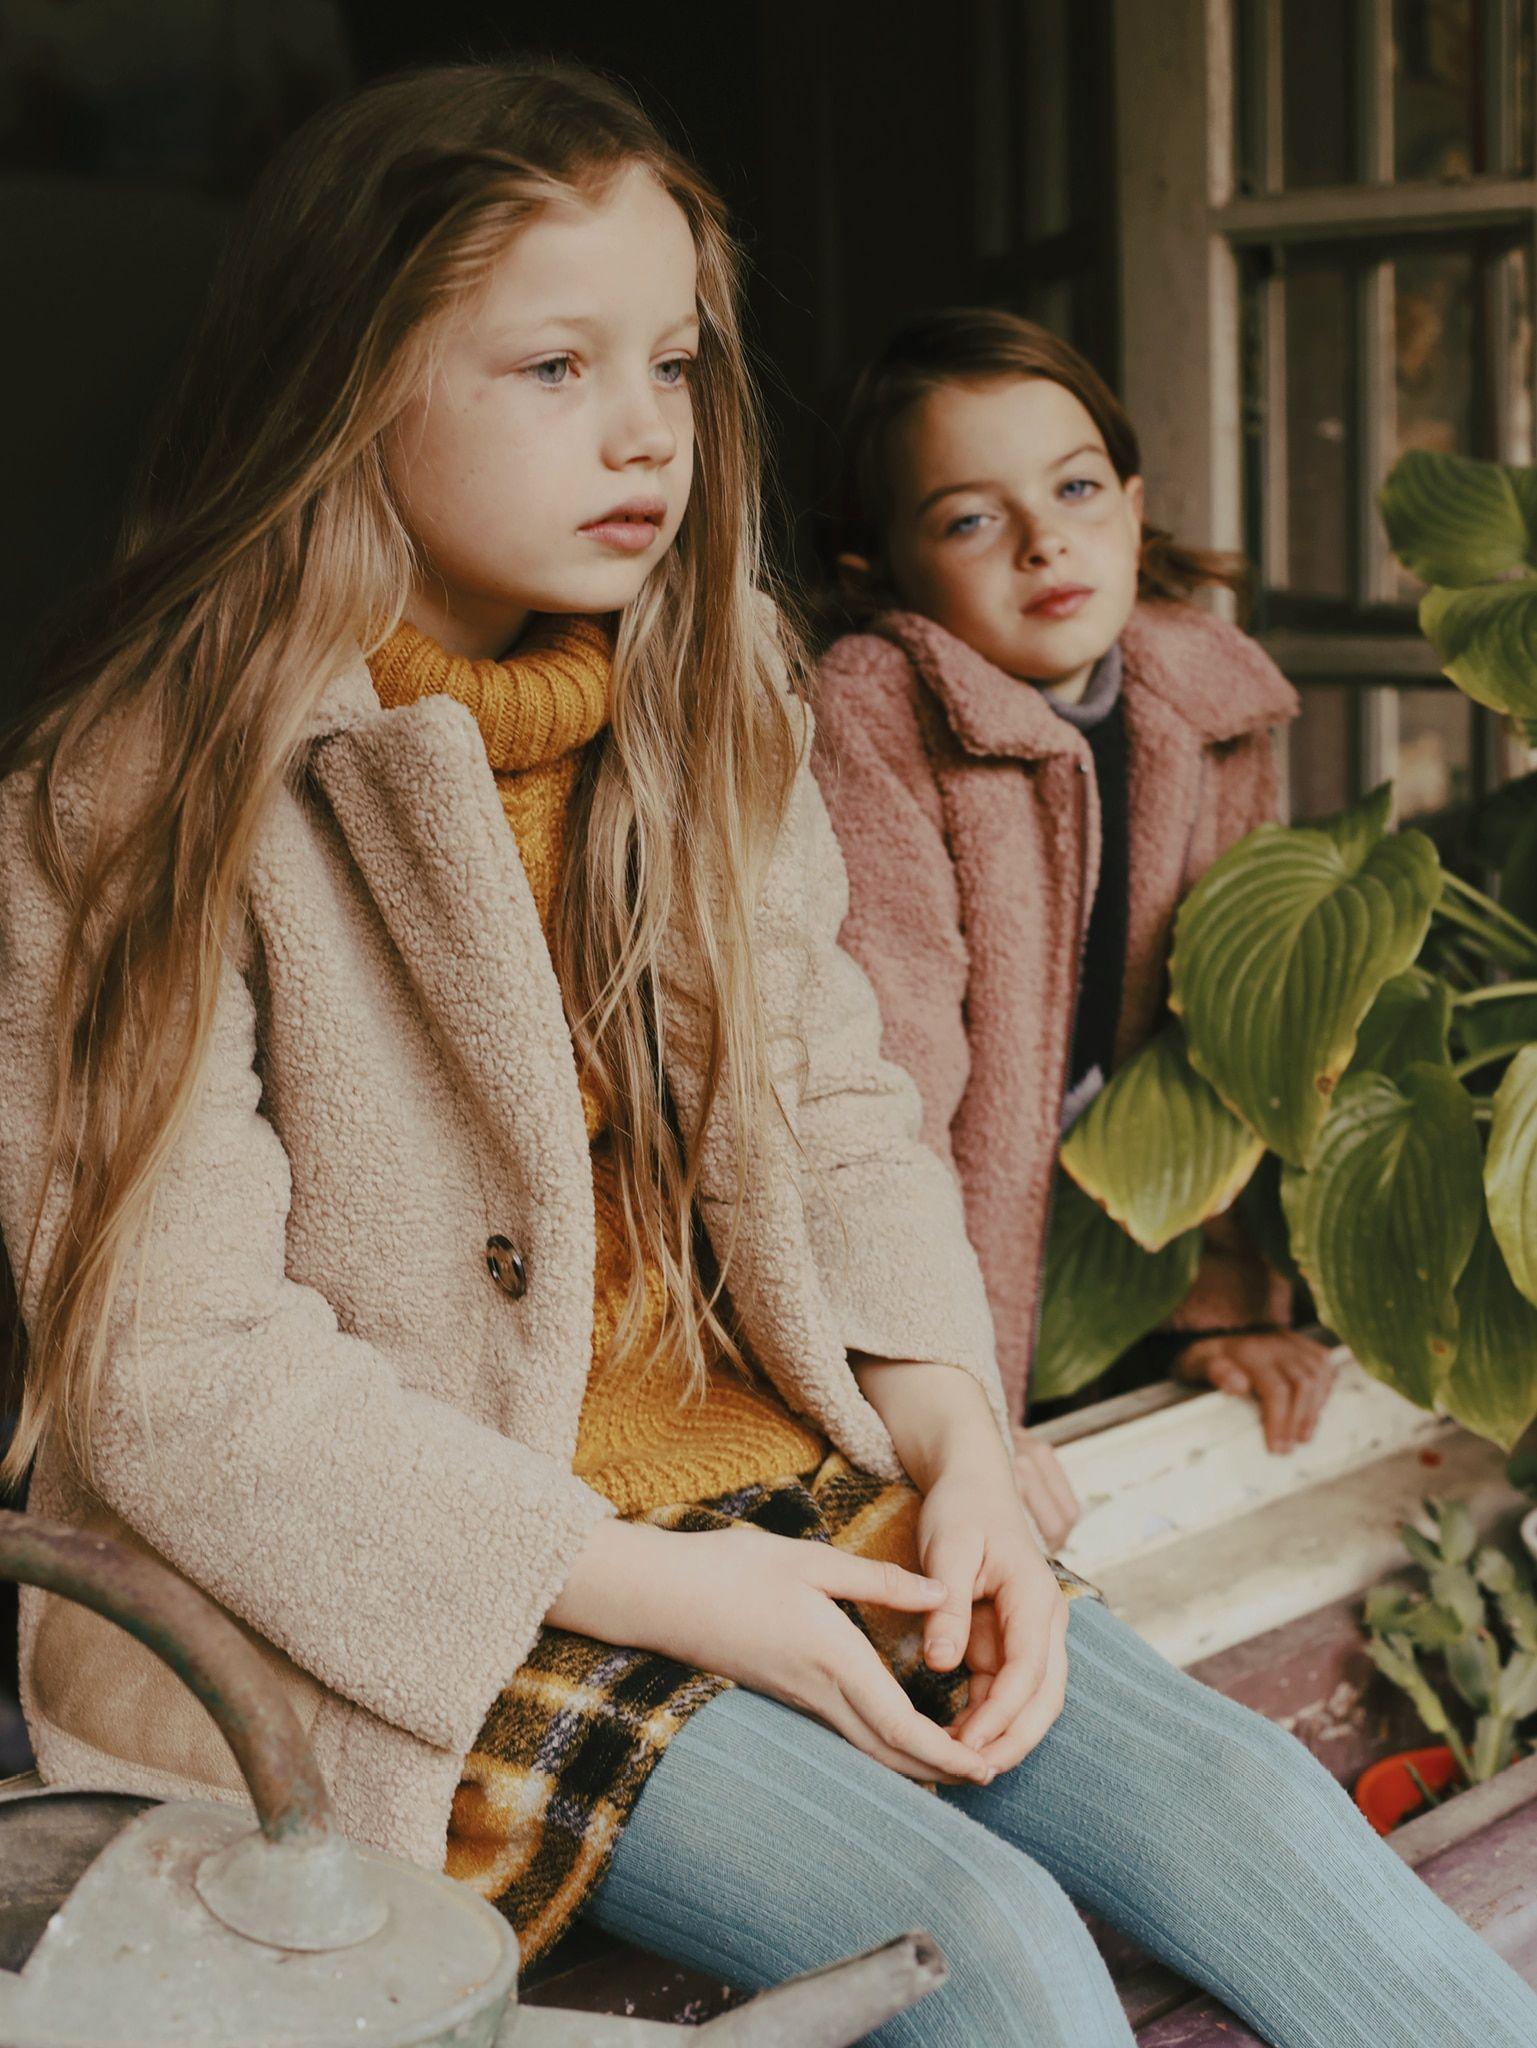 Kinderkleding Nederland.Experiences Voor Meisje 2018 Nederland Stylish Kids Fashion